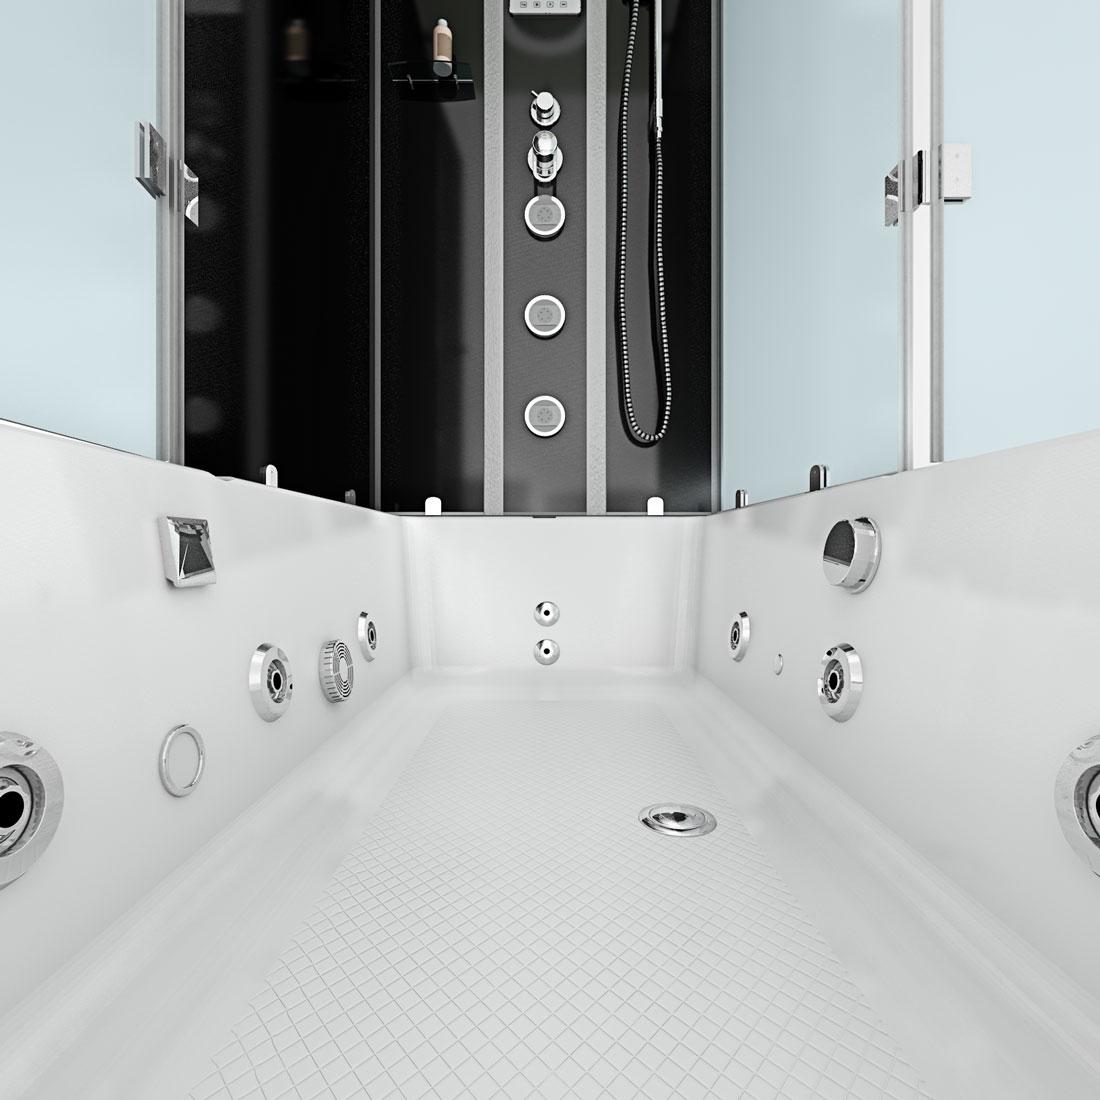 acquavapore dtp50 a303l dusch wannen kombi in 180x90cm trendbad24. Black Bedroom Furniture Sets. Home Design Ideas